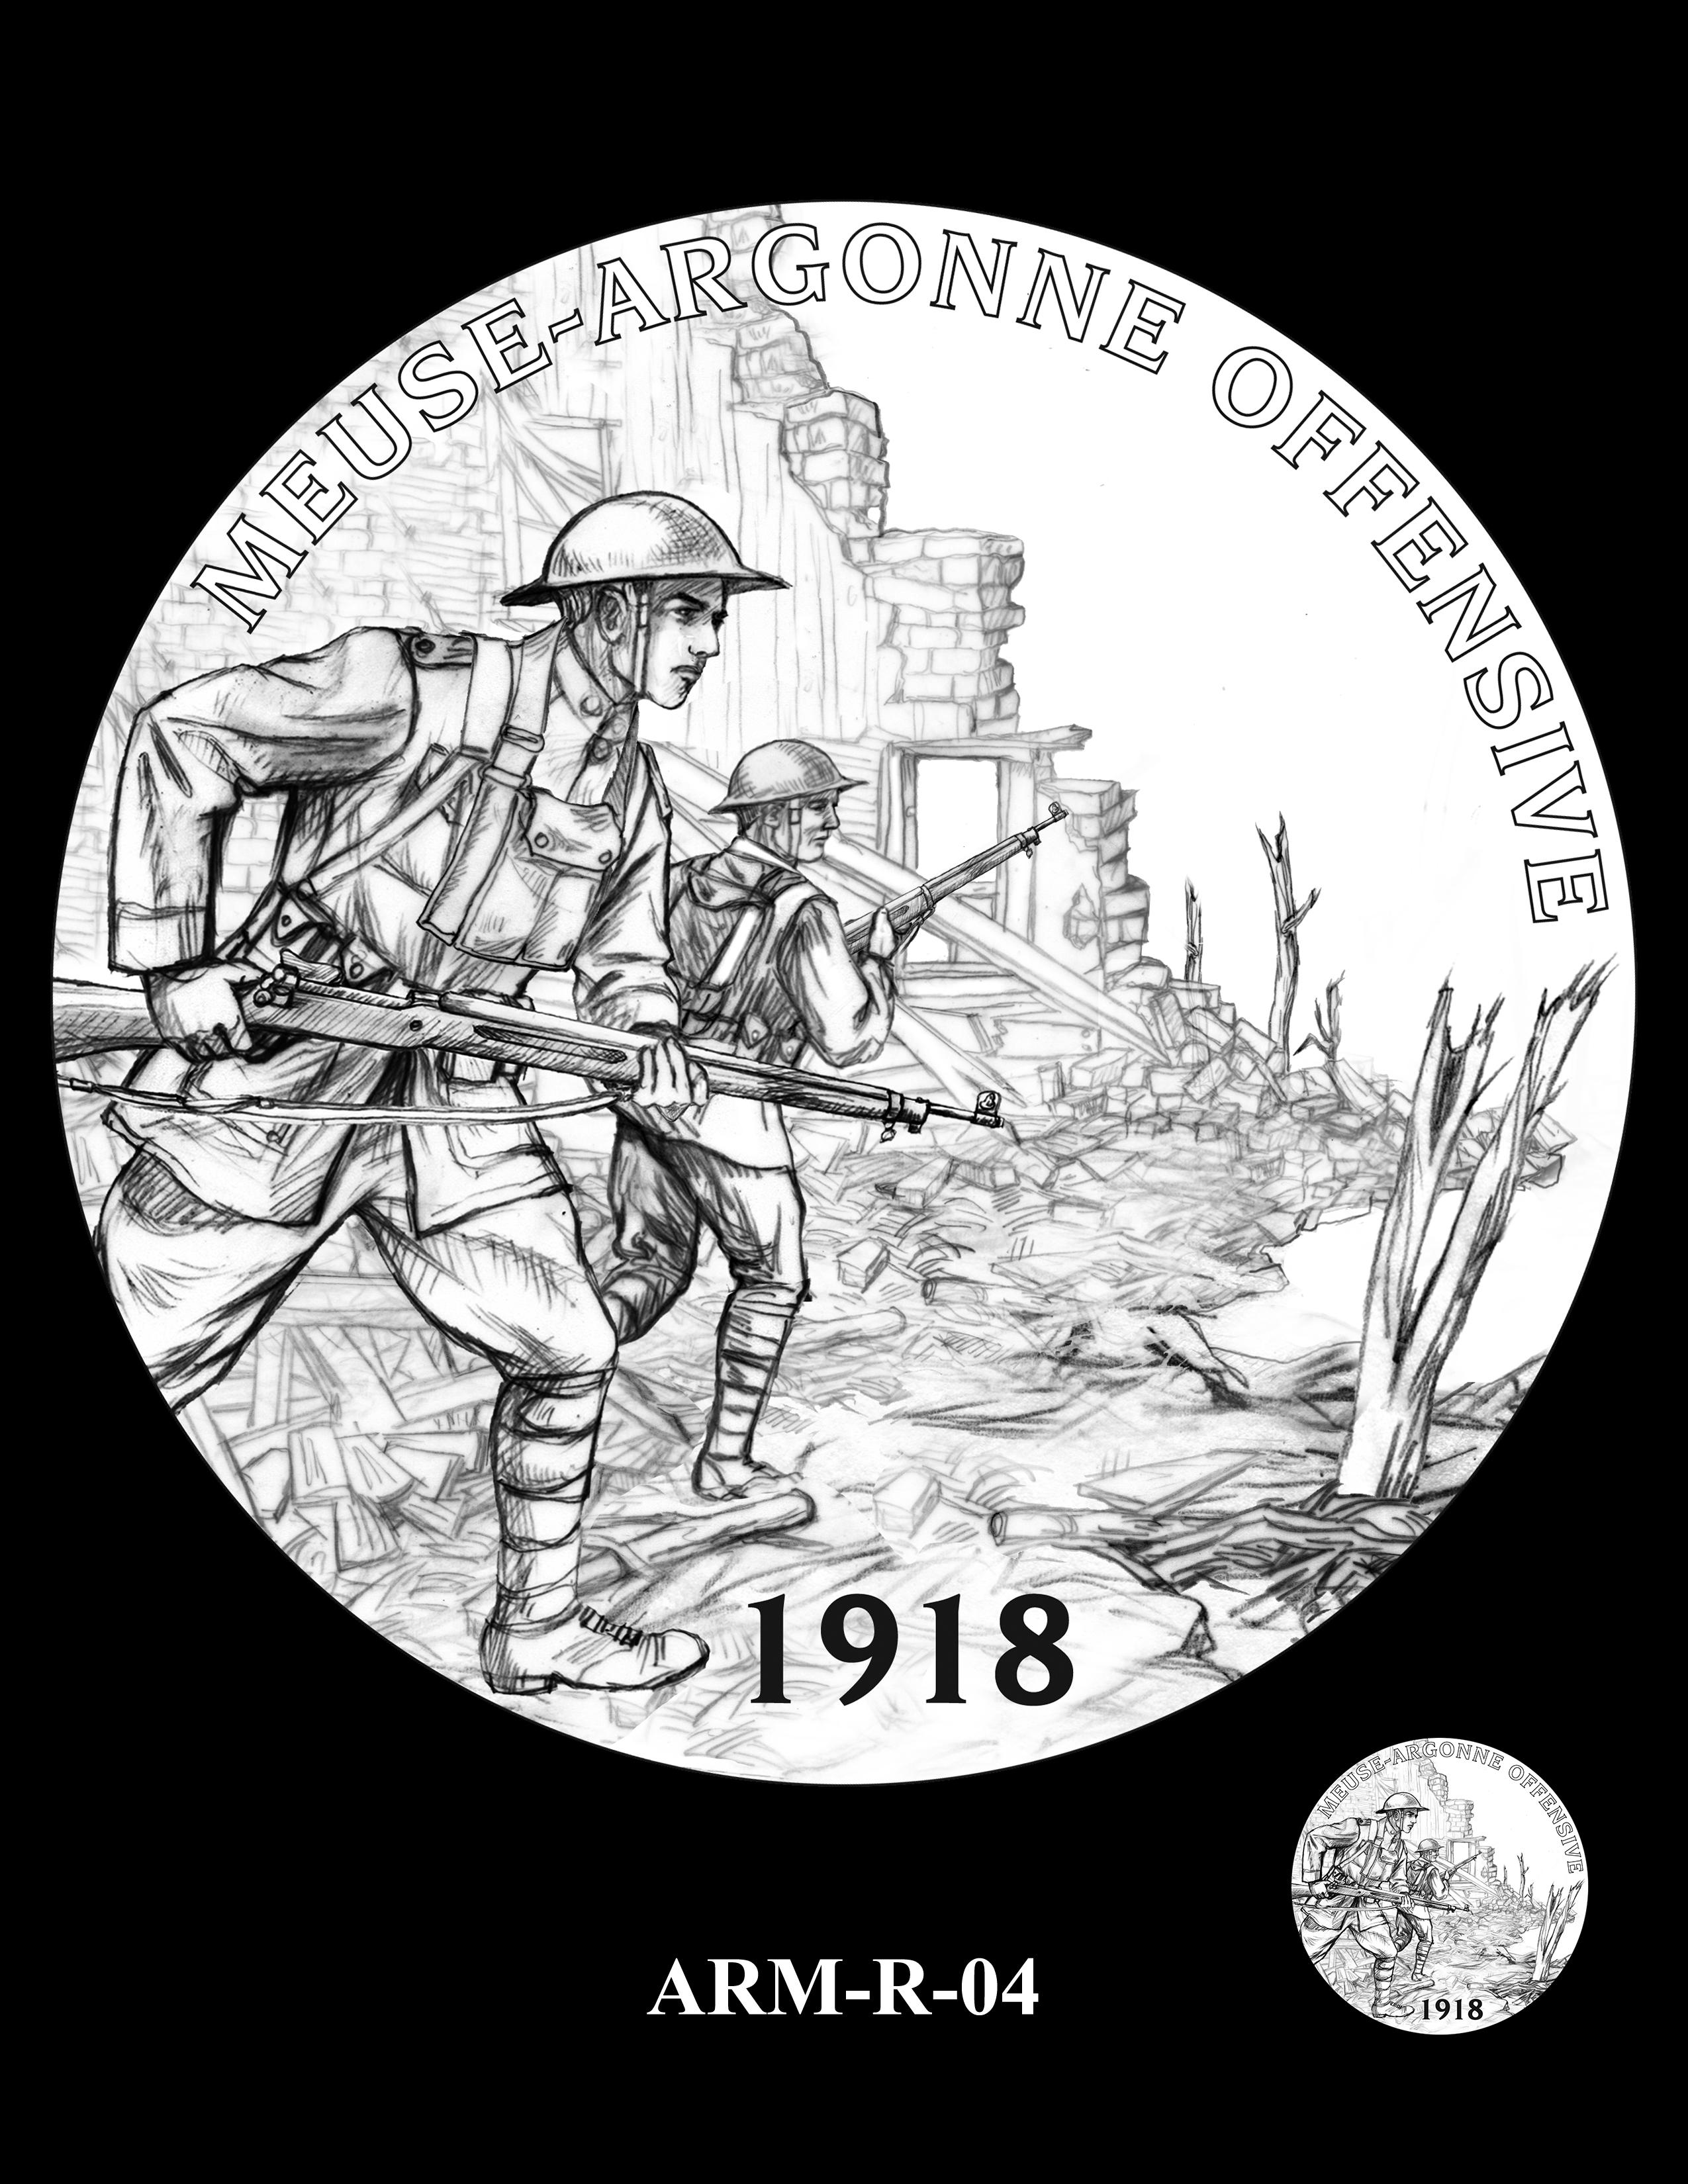 P1-ARM-R-04 --2018-World War I Silver Medals - Army